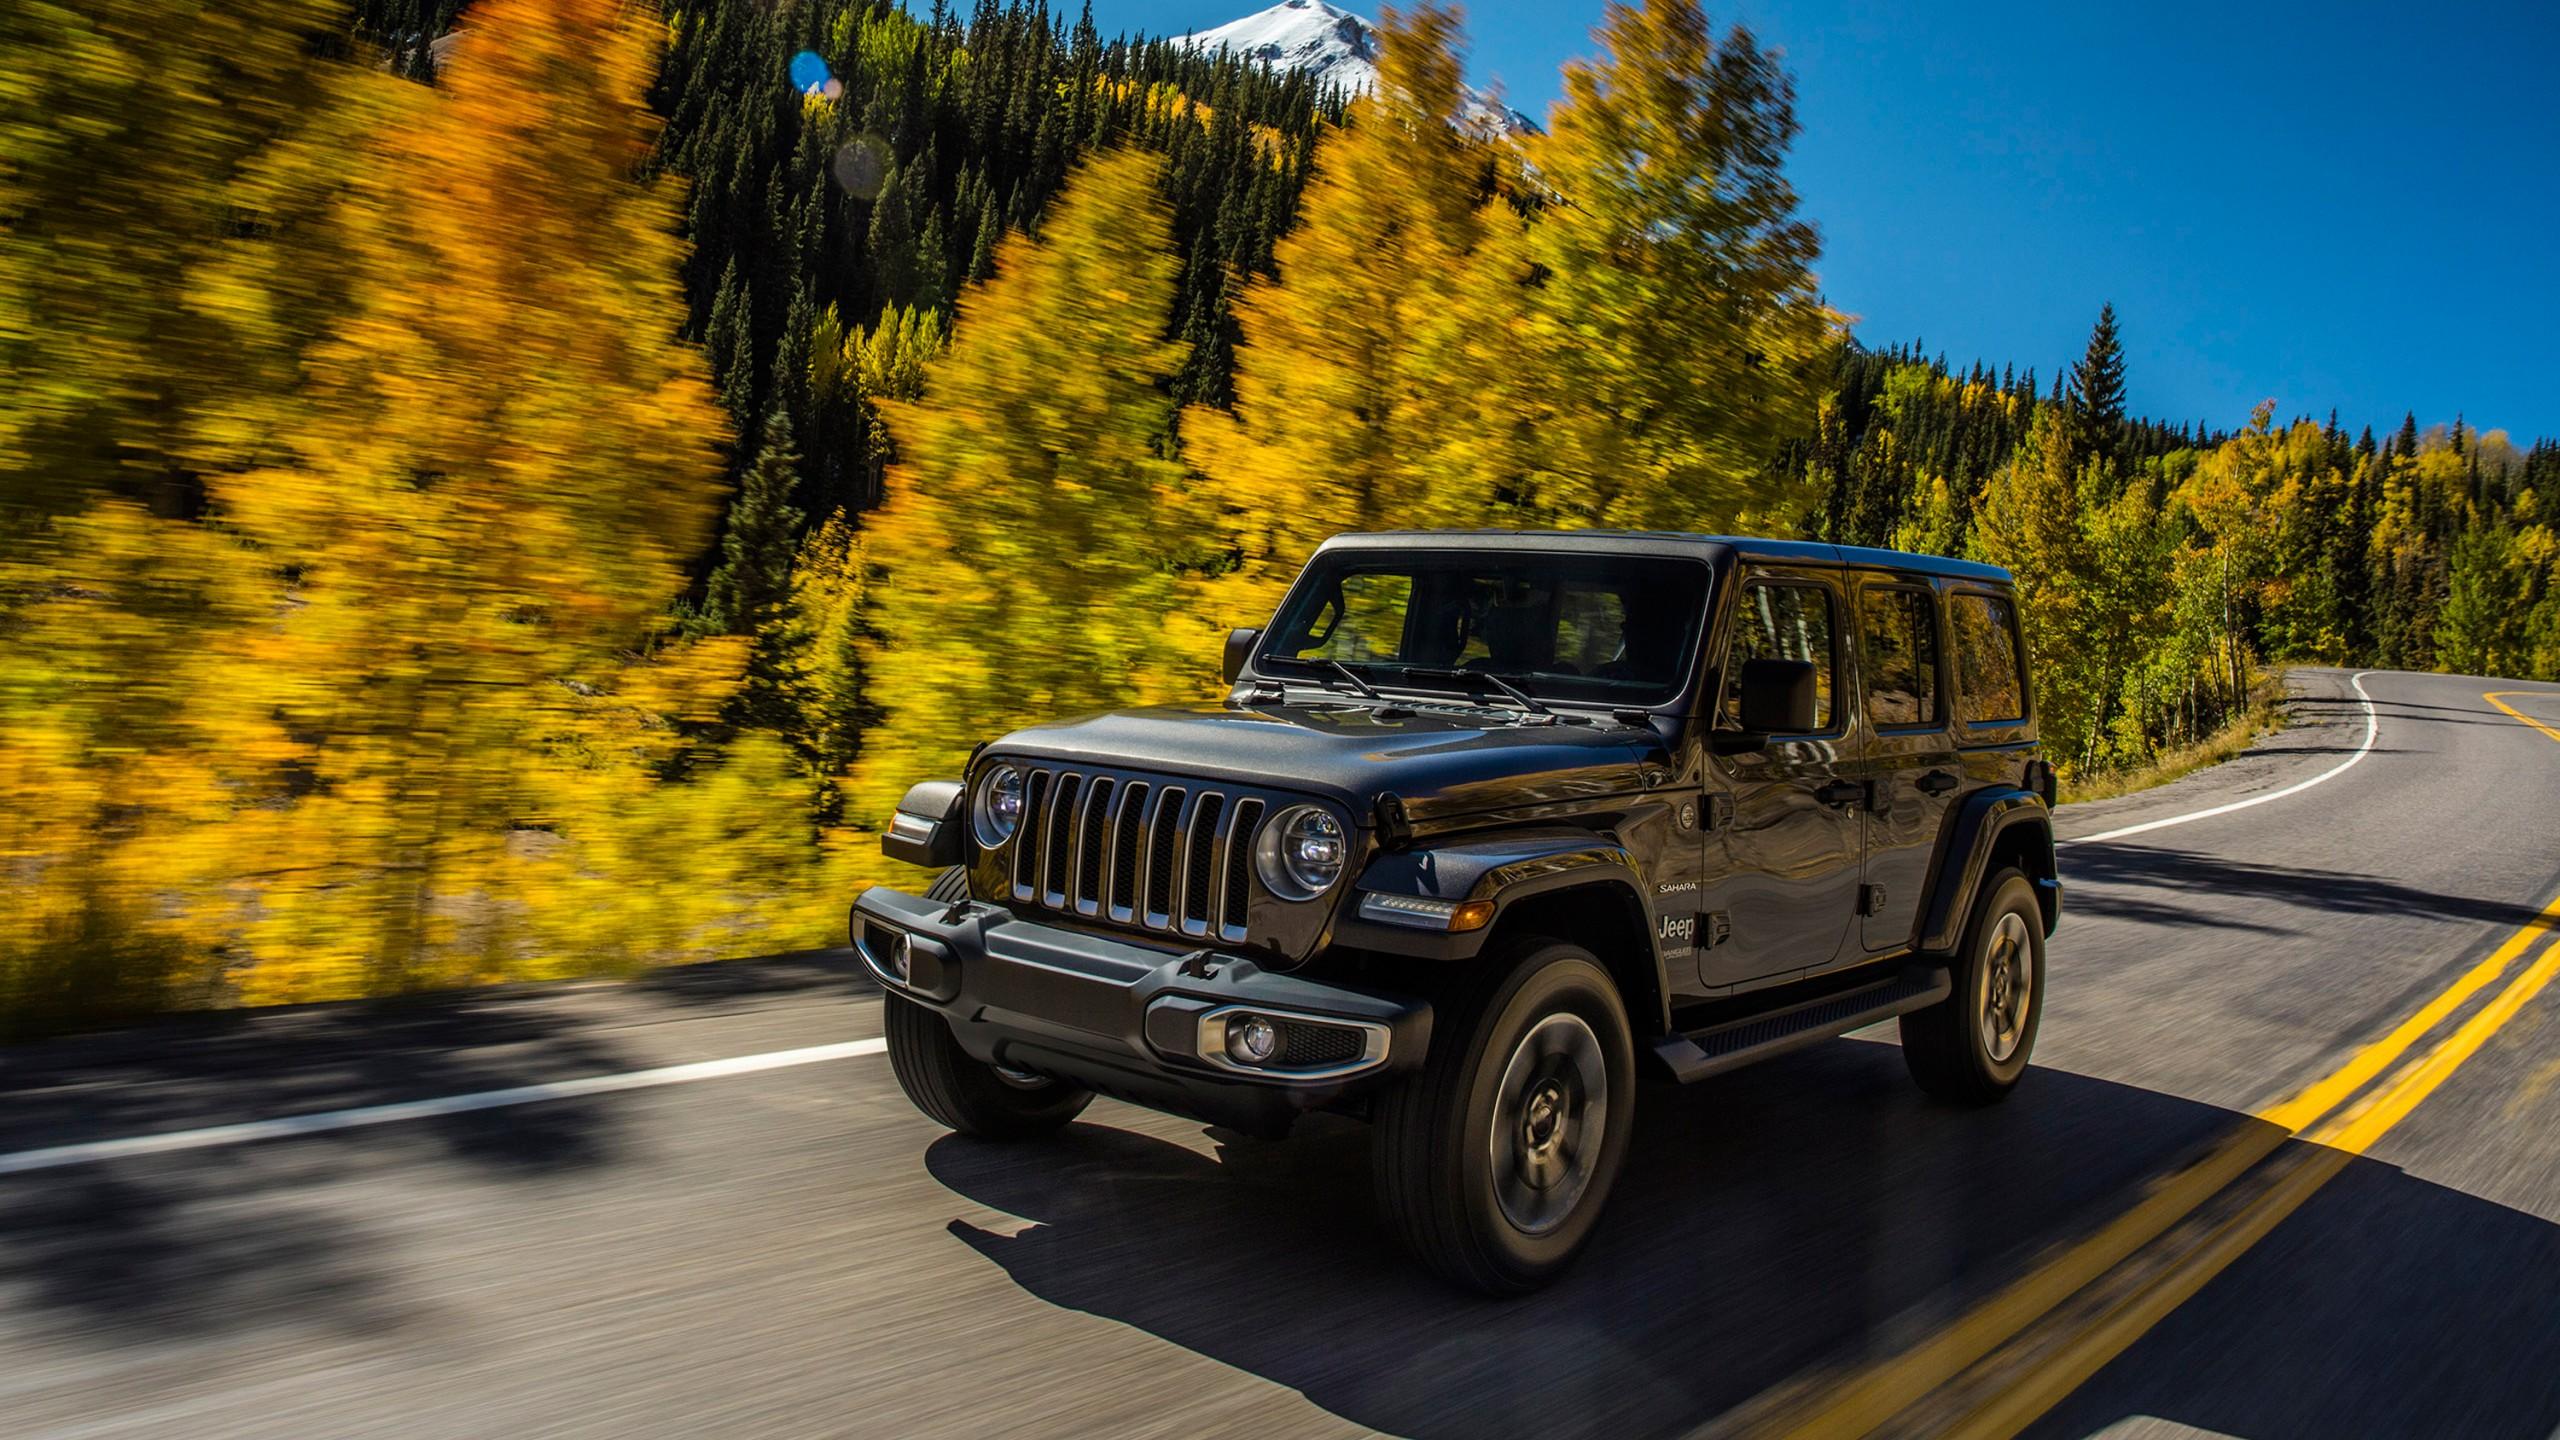 Jeep Wrangler, SUV, 2019 Cars, 4K